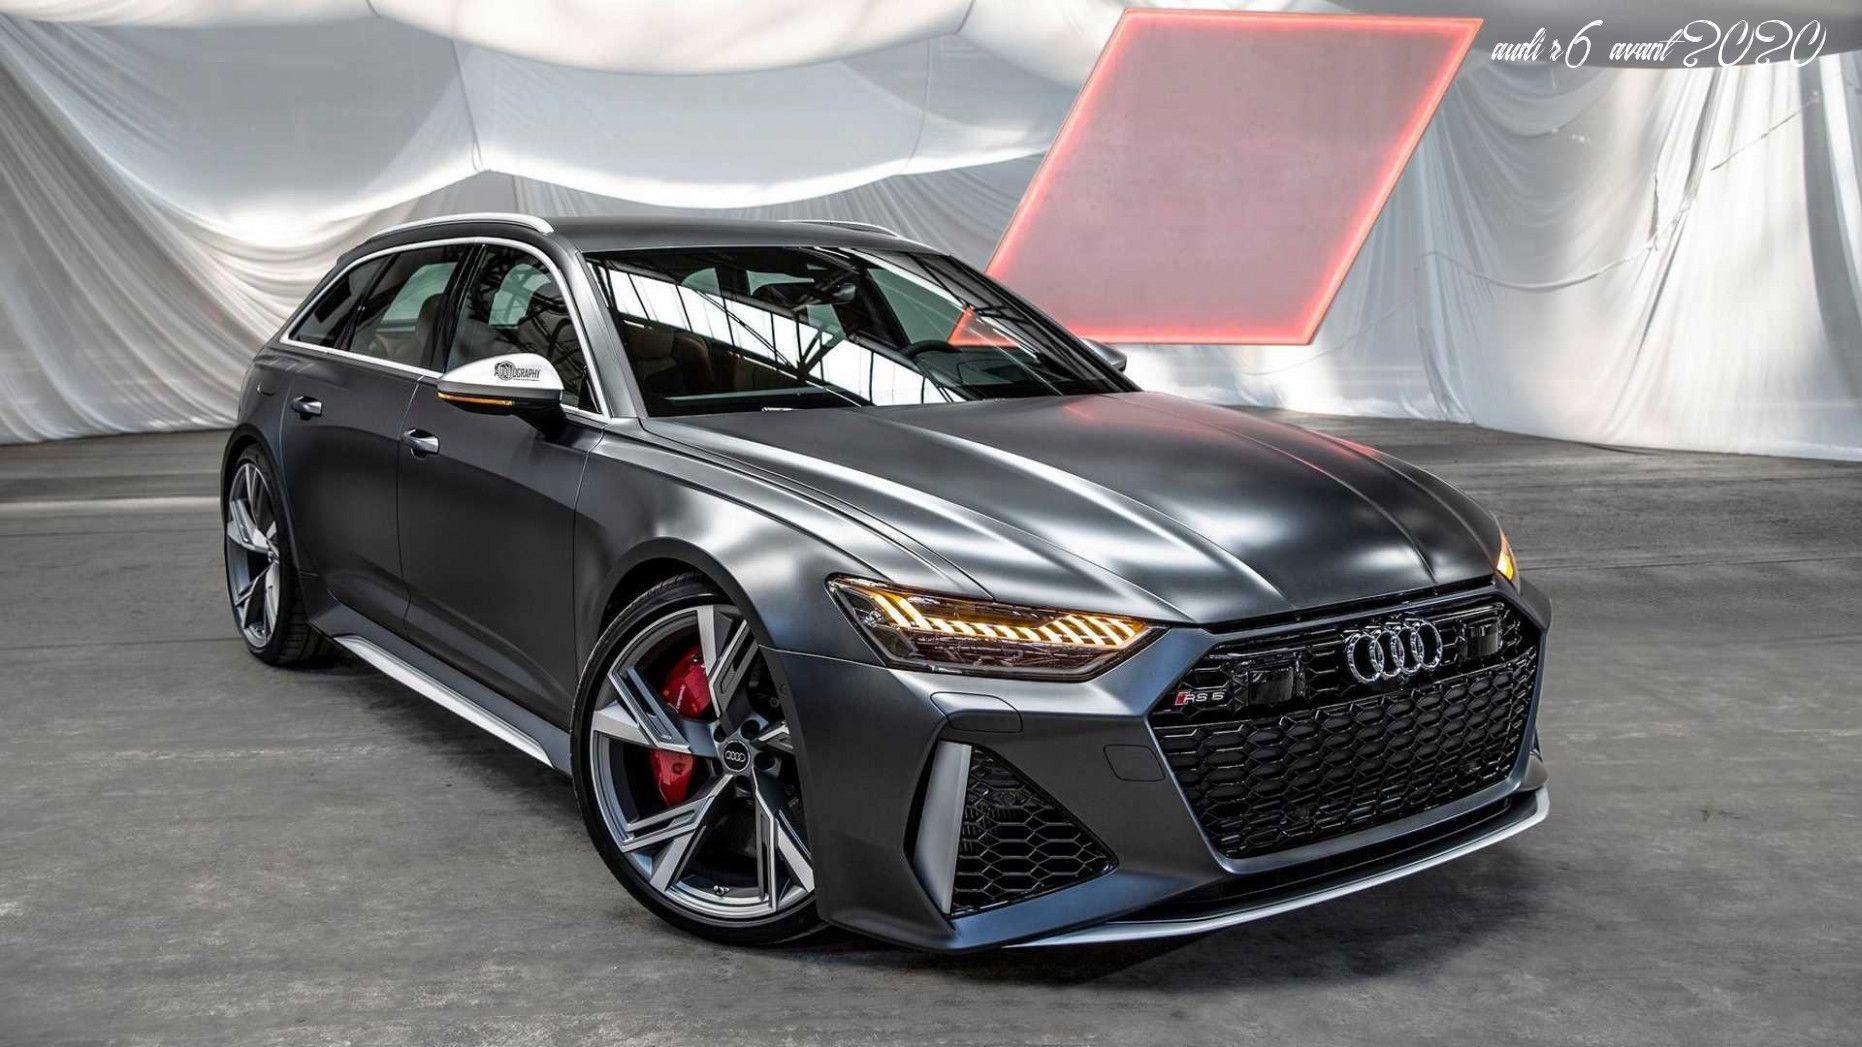 Audi R6 Avant 2020 Configurations In 2020 Audi Rs6 Audi Rs Audi Wagon